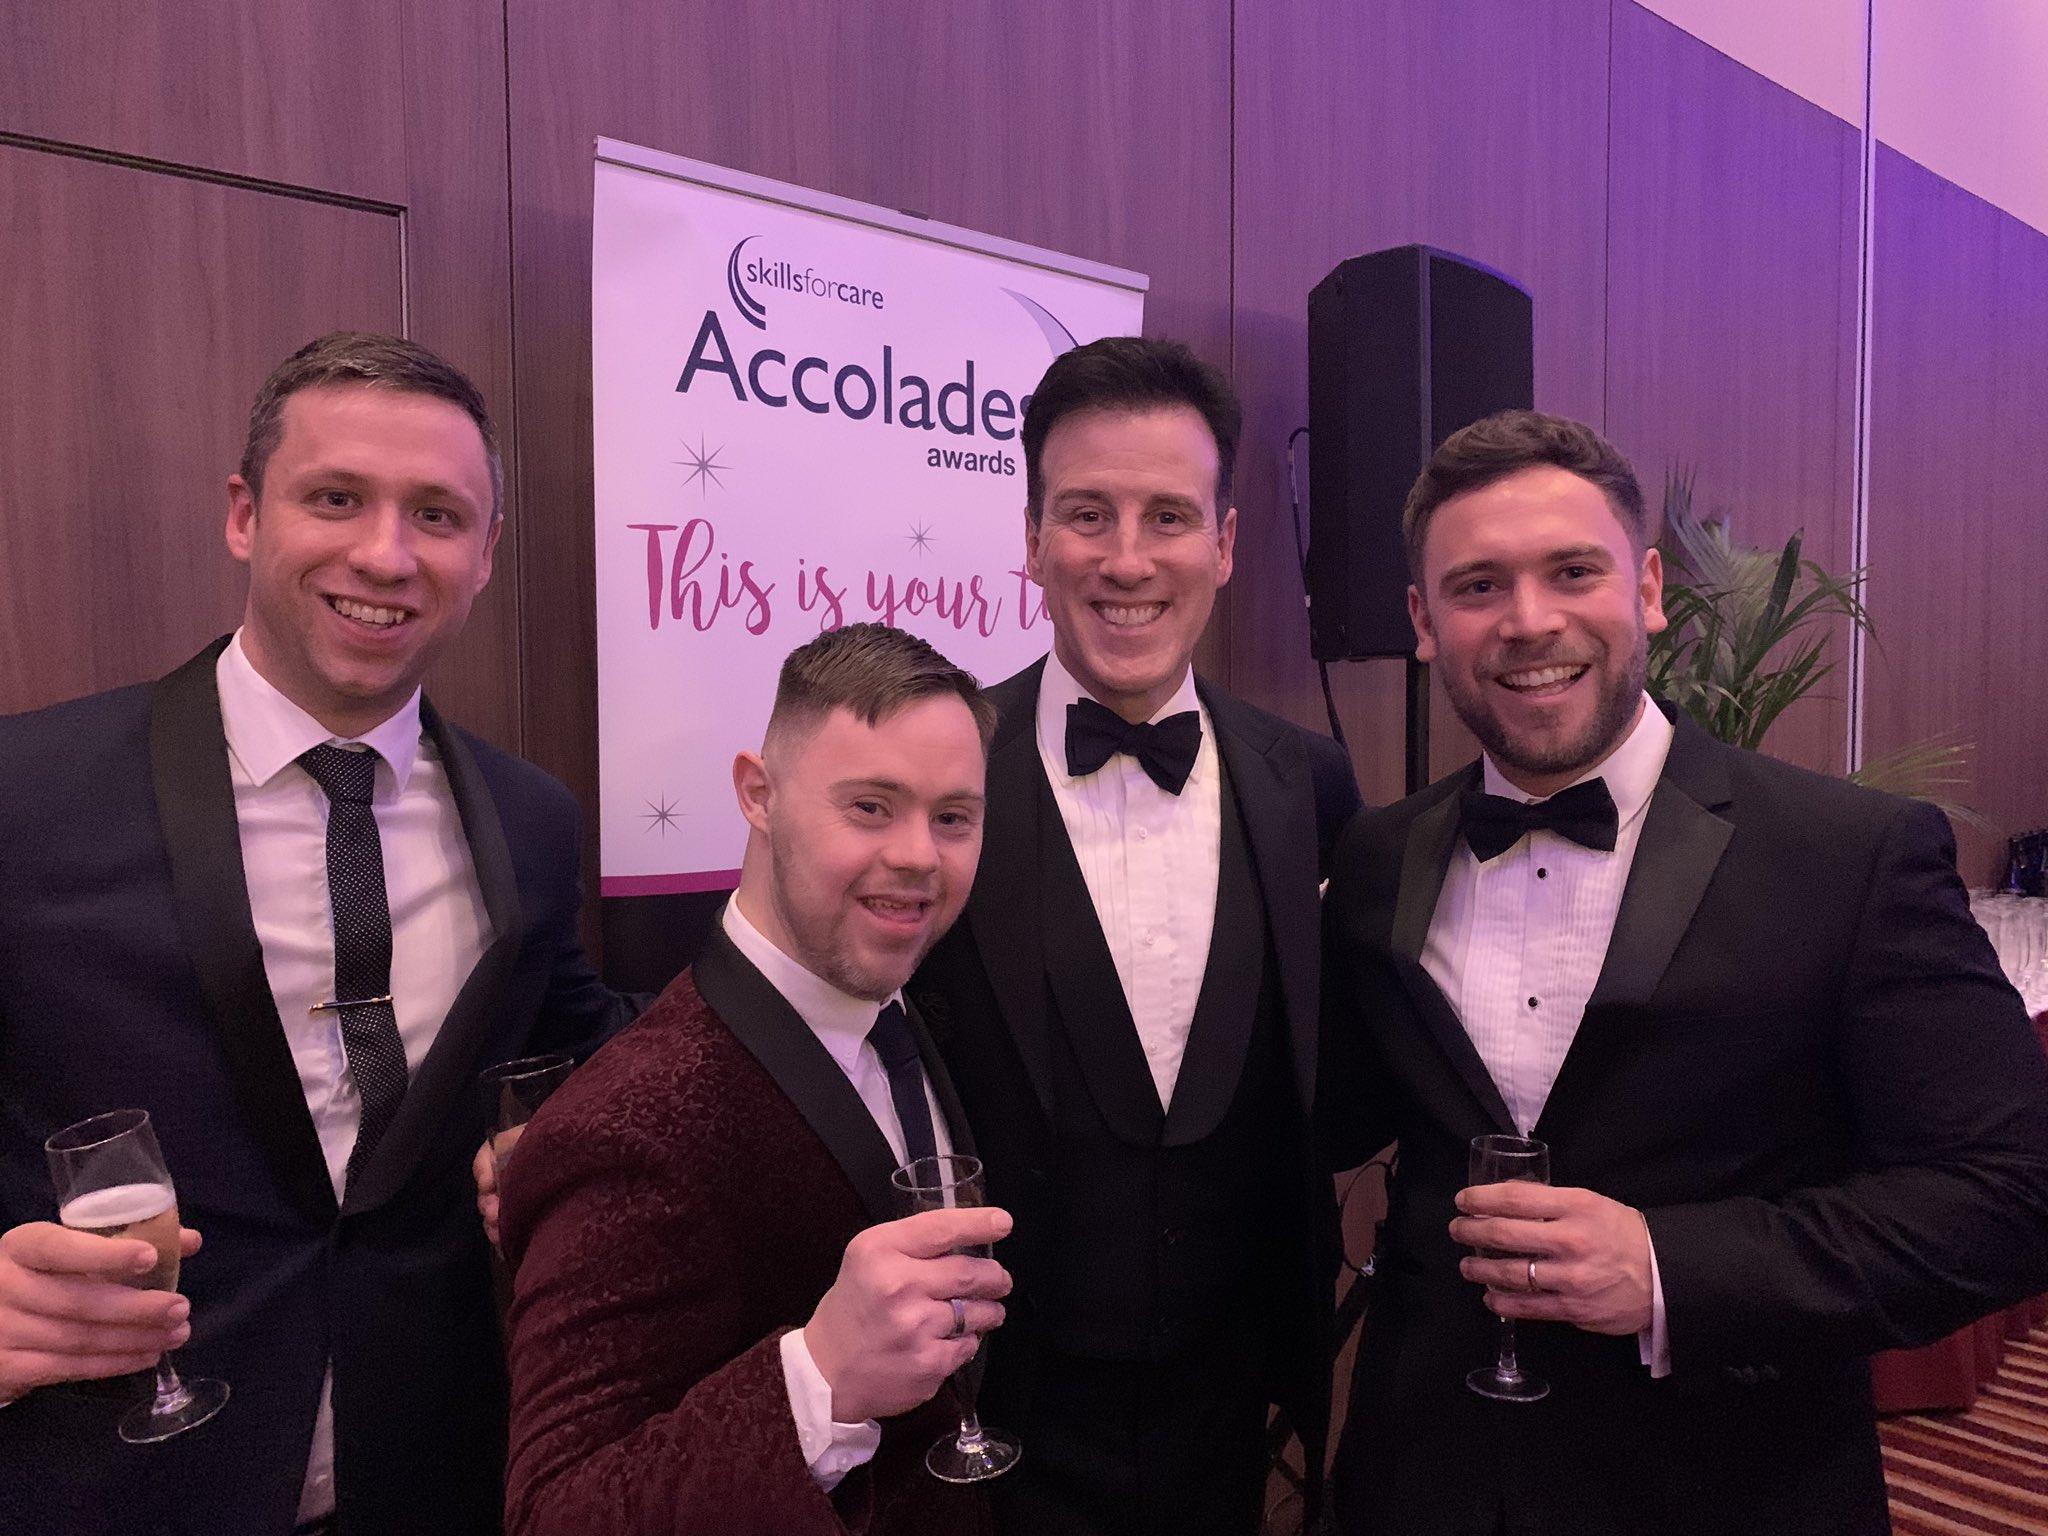 Skills for Care Accolade Awards